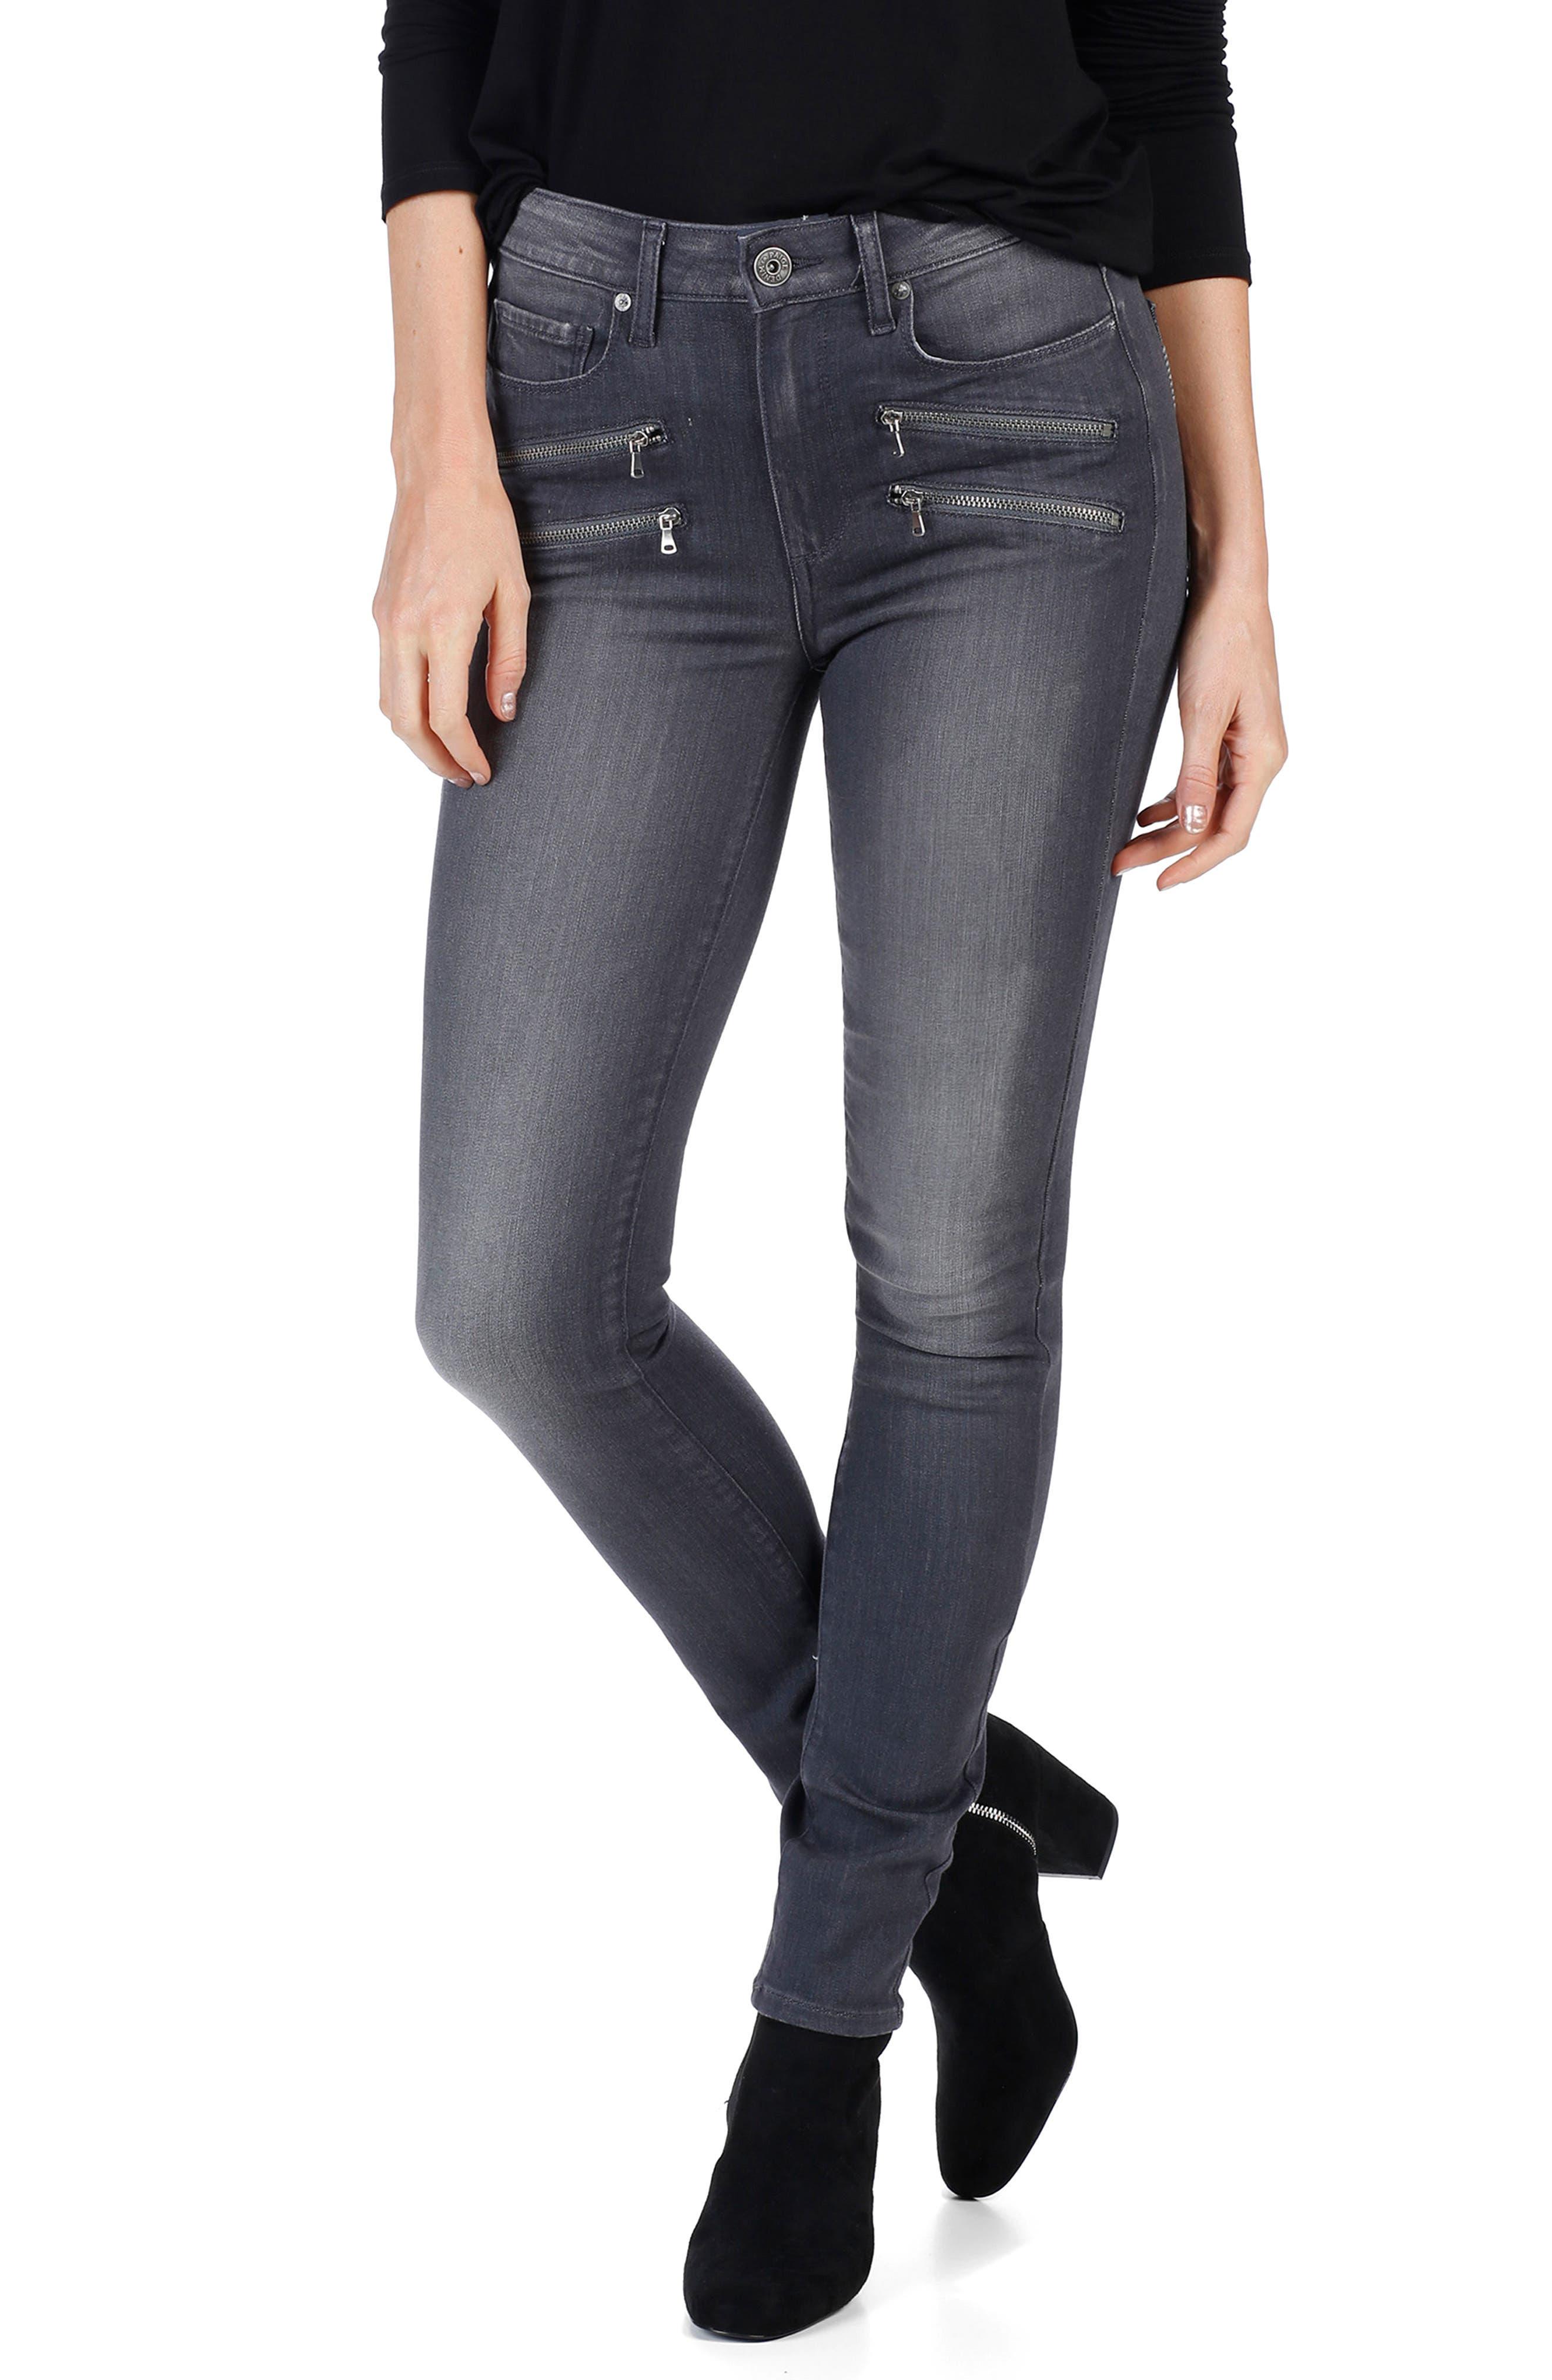 Transcend - Edgemont High Waist Skinny Jeans,                         Main,                         color, 020